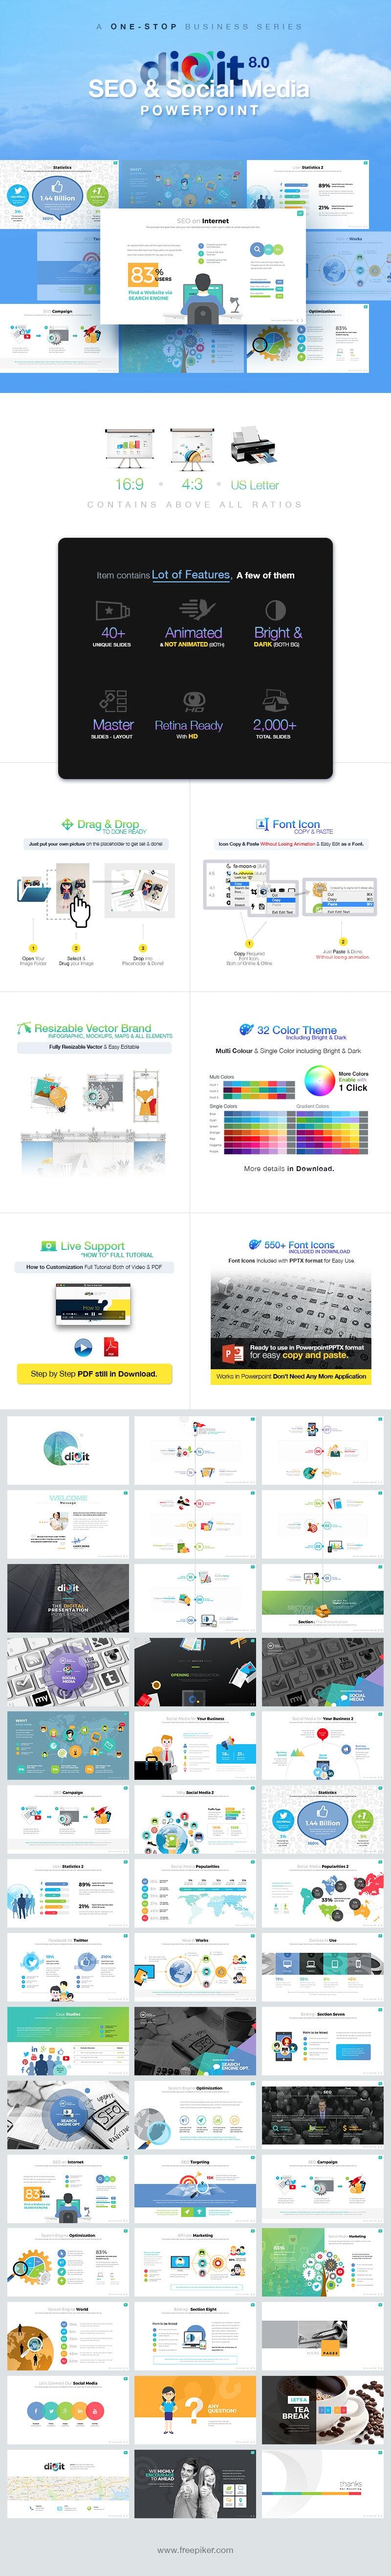 SEO & Social Media Powerpoint | Digit 8